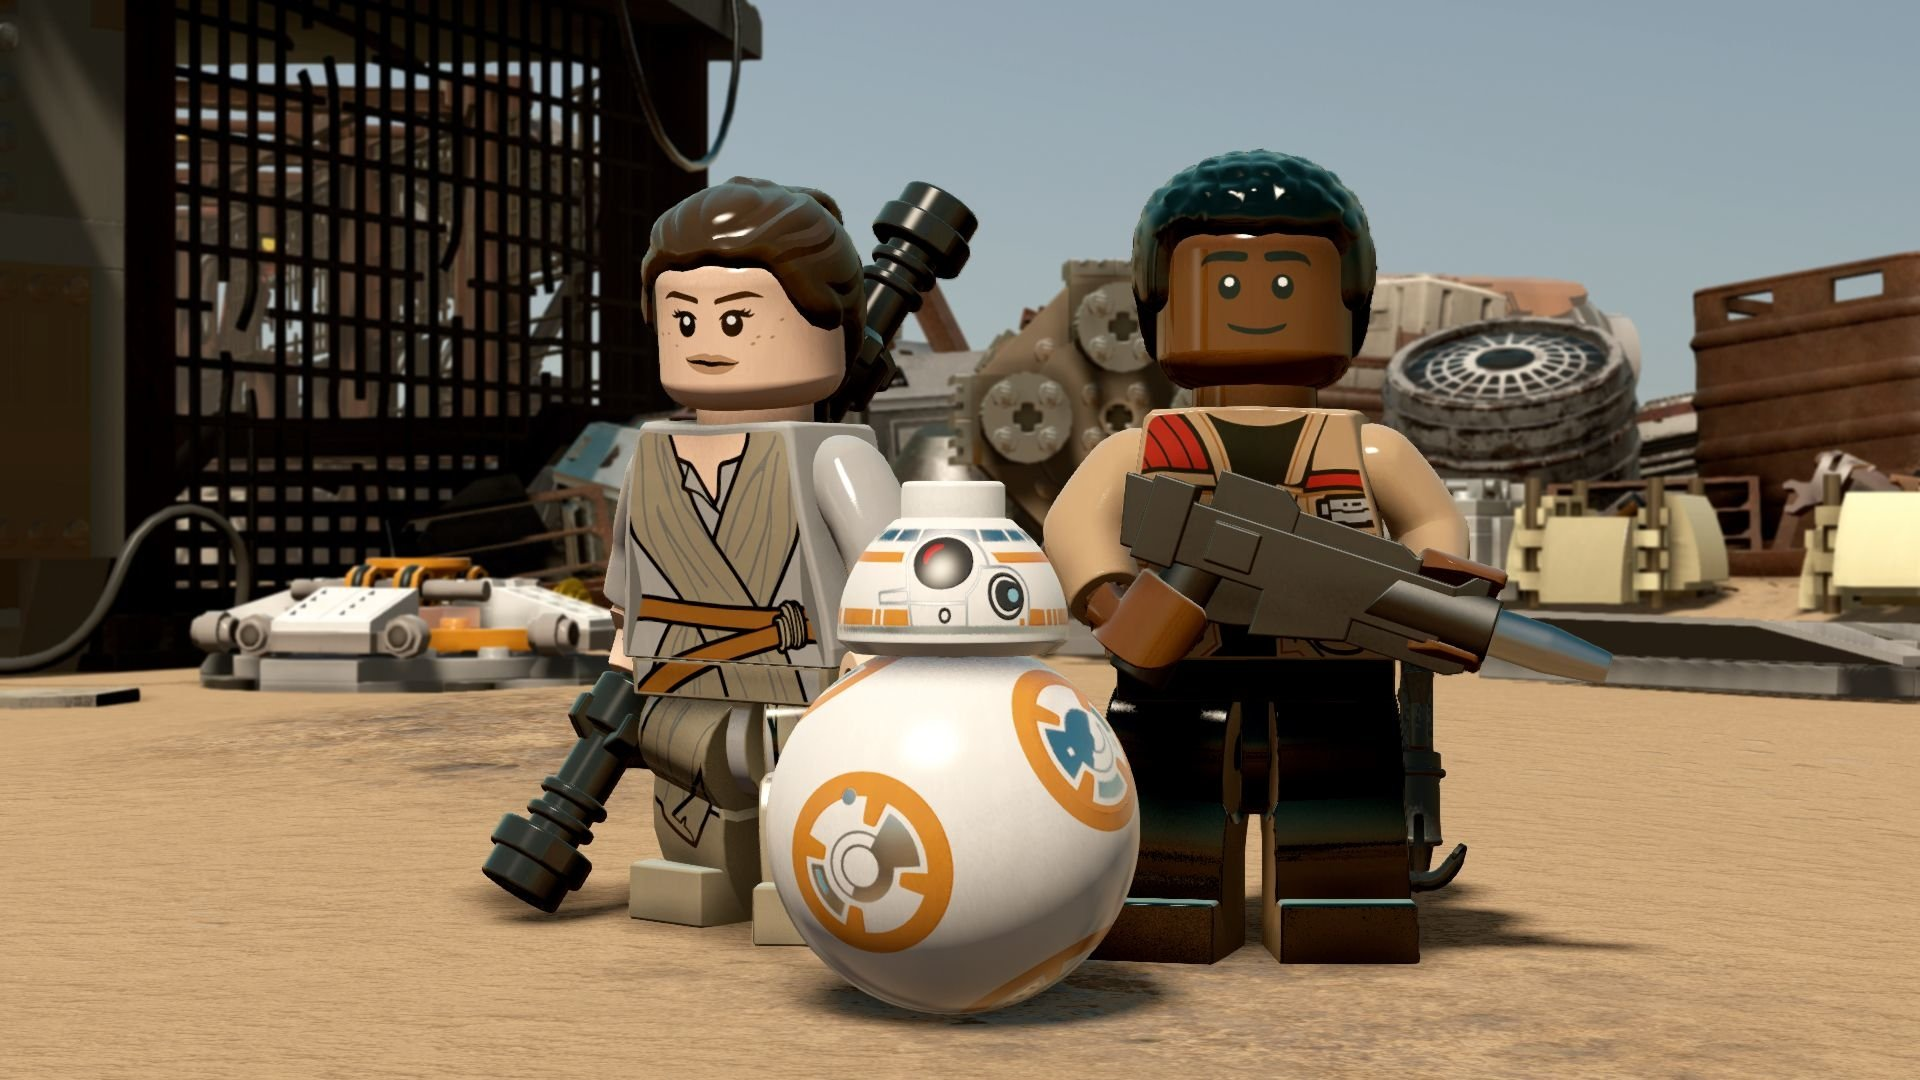 Lego Star Wars All Stars , HD Wallpaper & Backgrounds